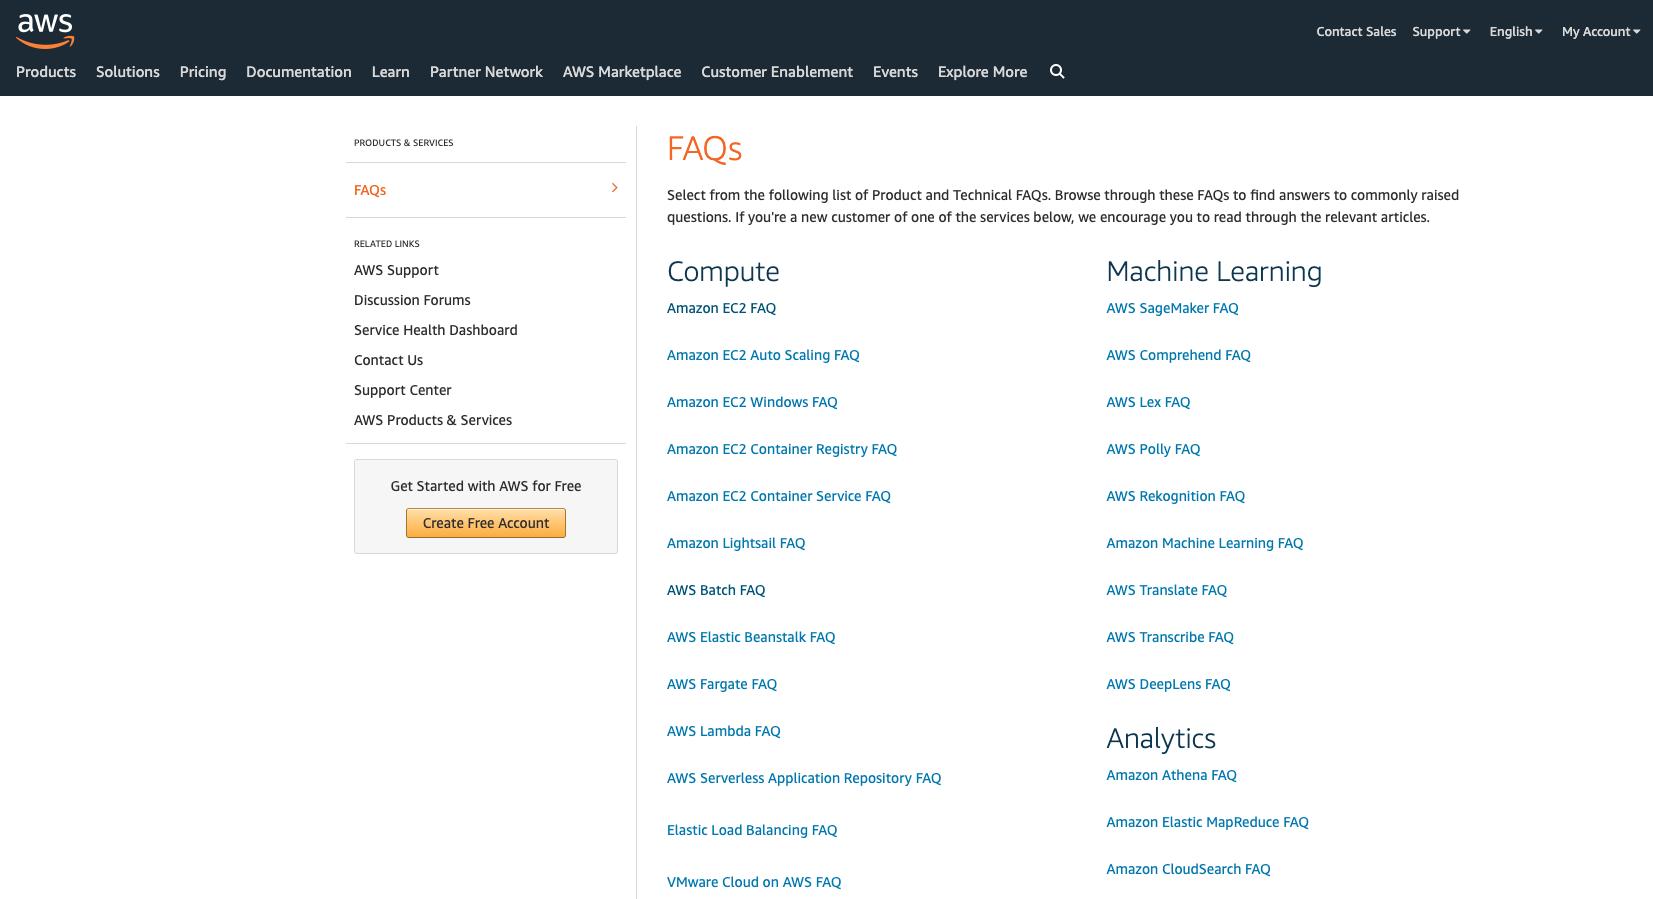 Amazon web services FAQ page